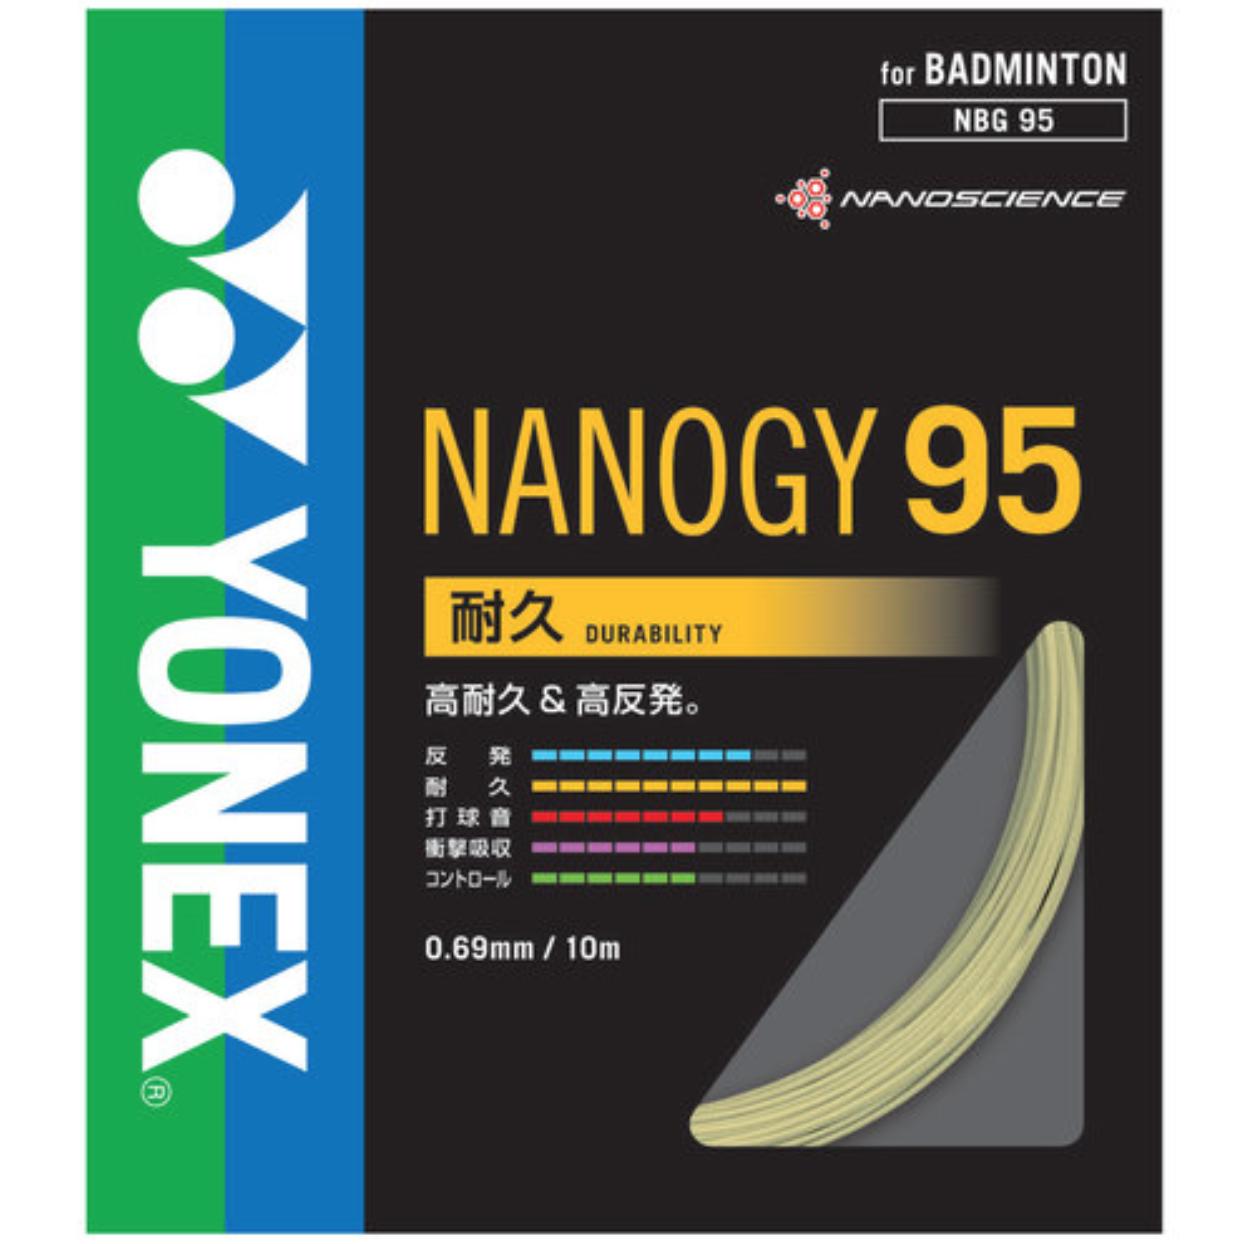 NANOGY 95(ナノジー95)